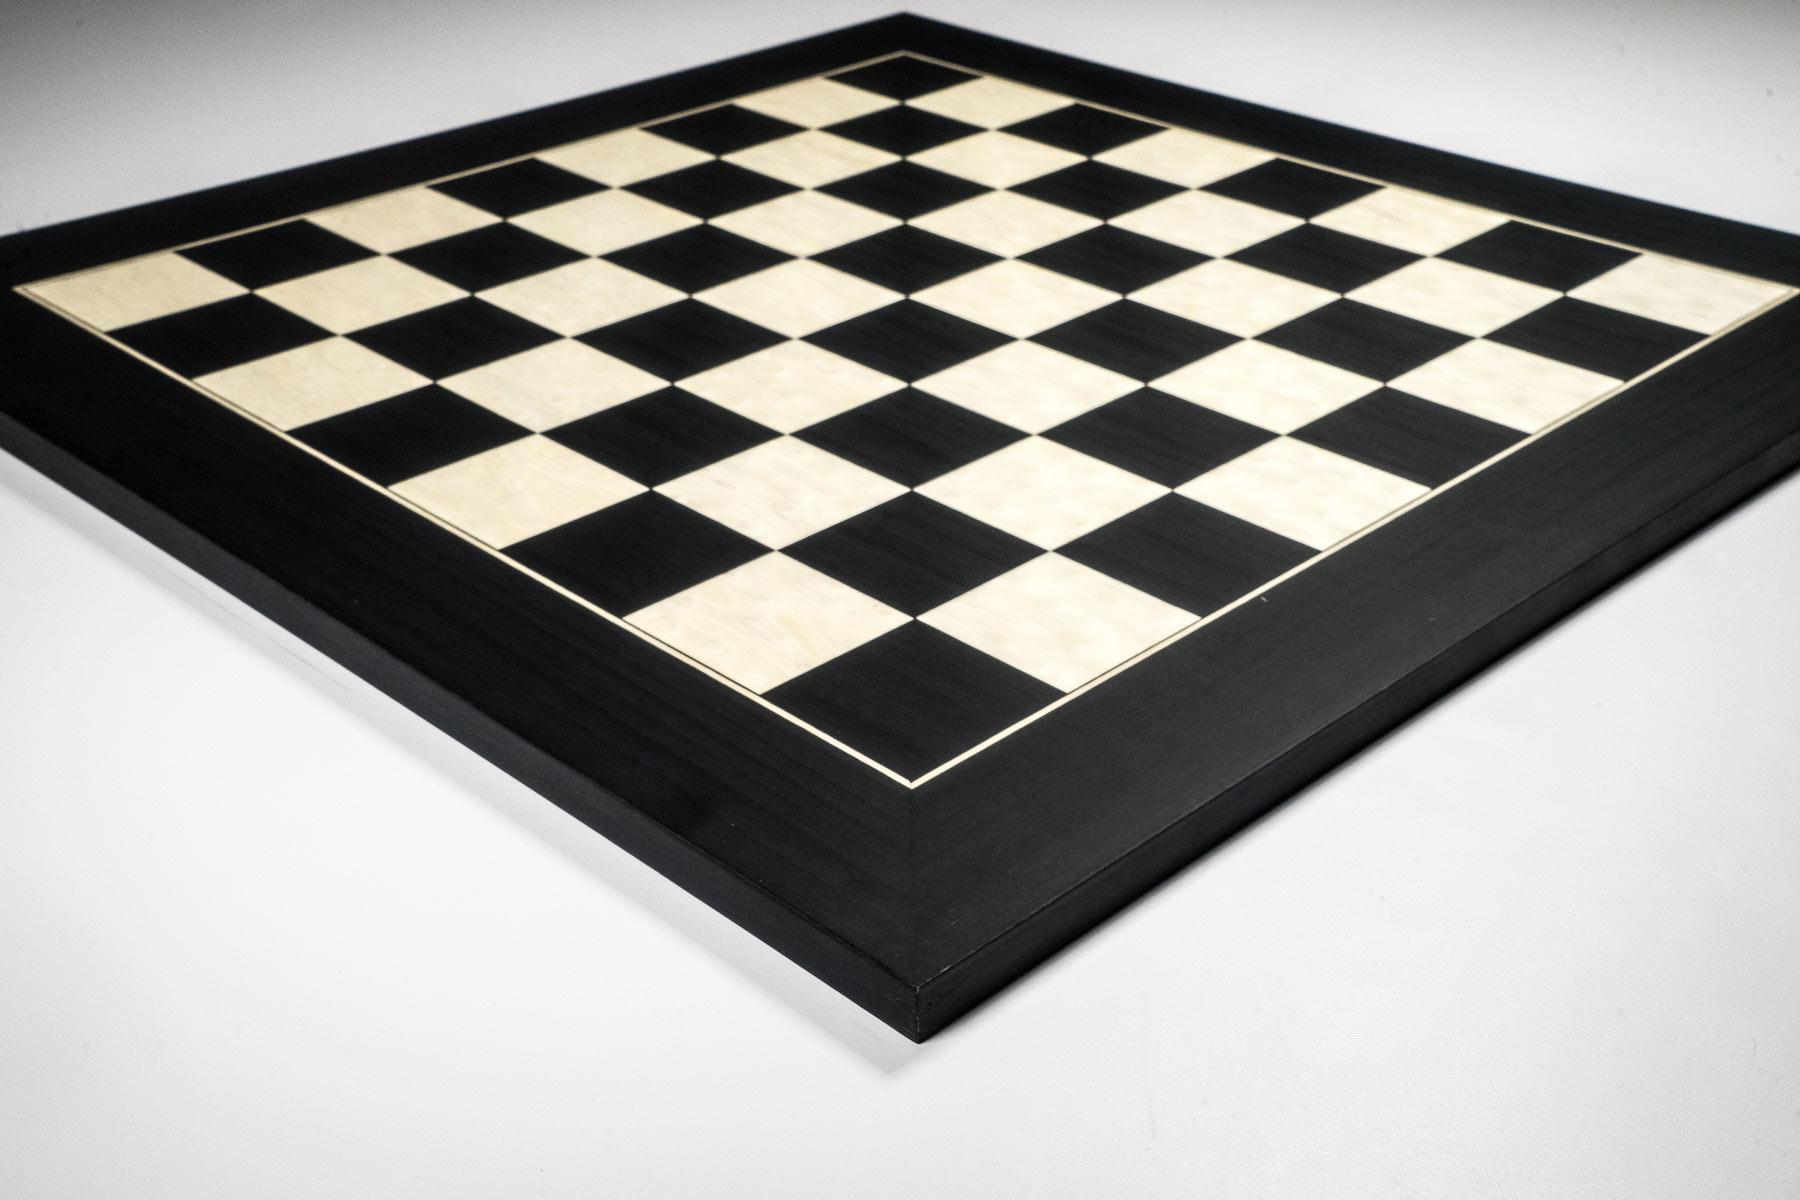 Deluxe Black Chess